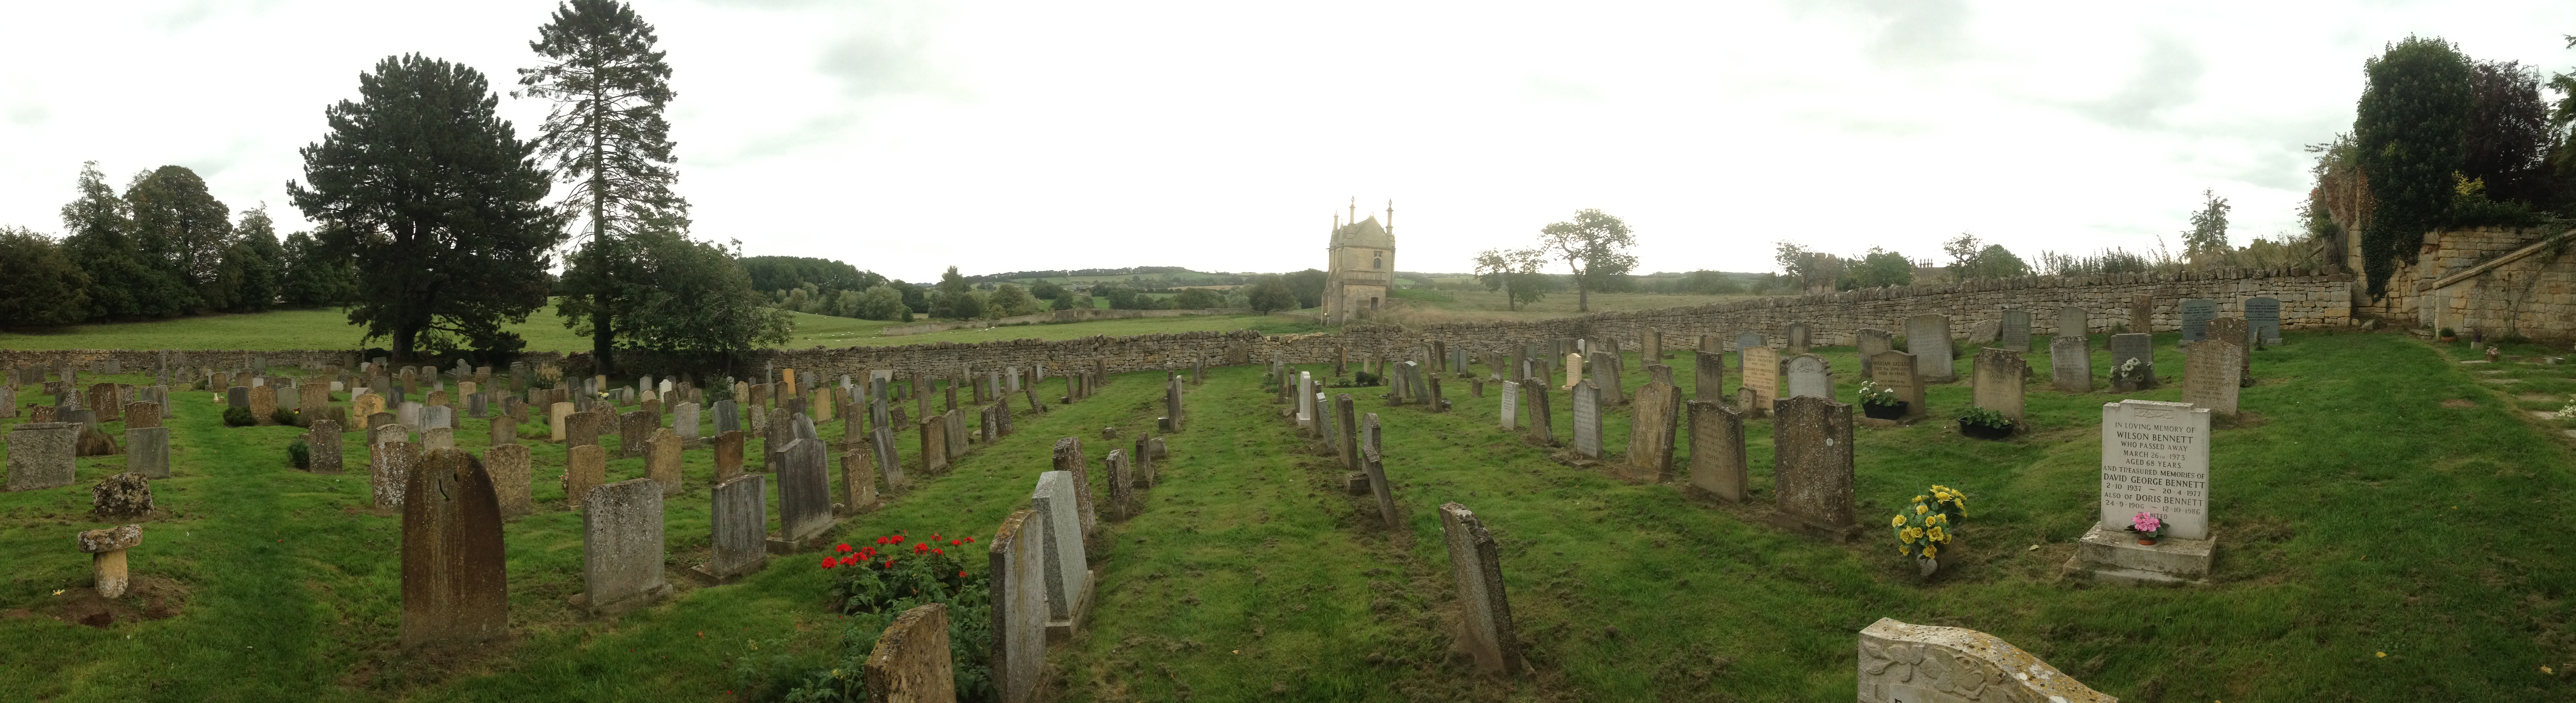 St James's Churchyard